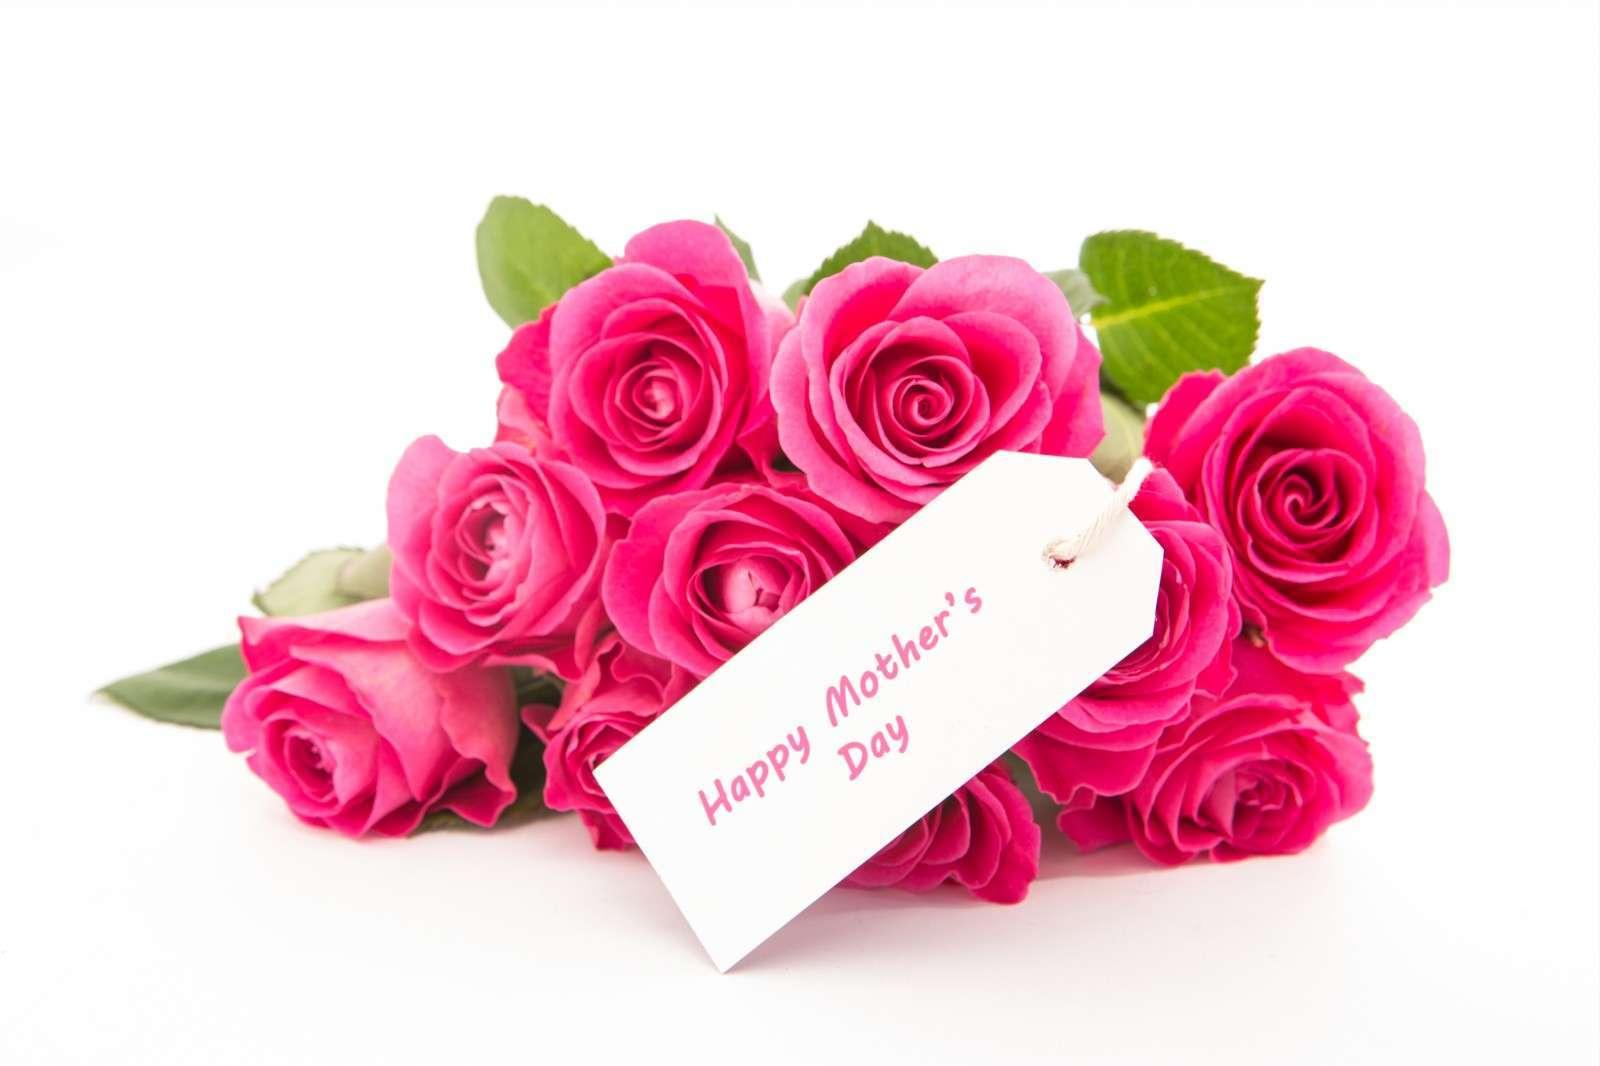 Mothers Day Images Free Download | PixelsTalk Net